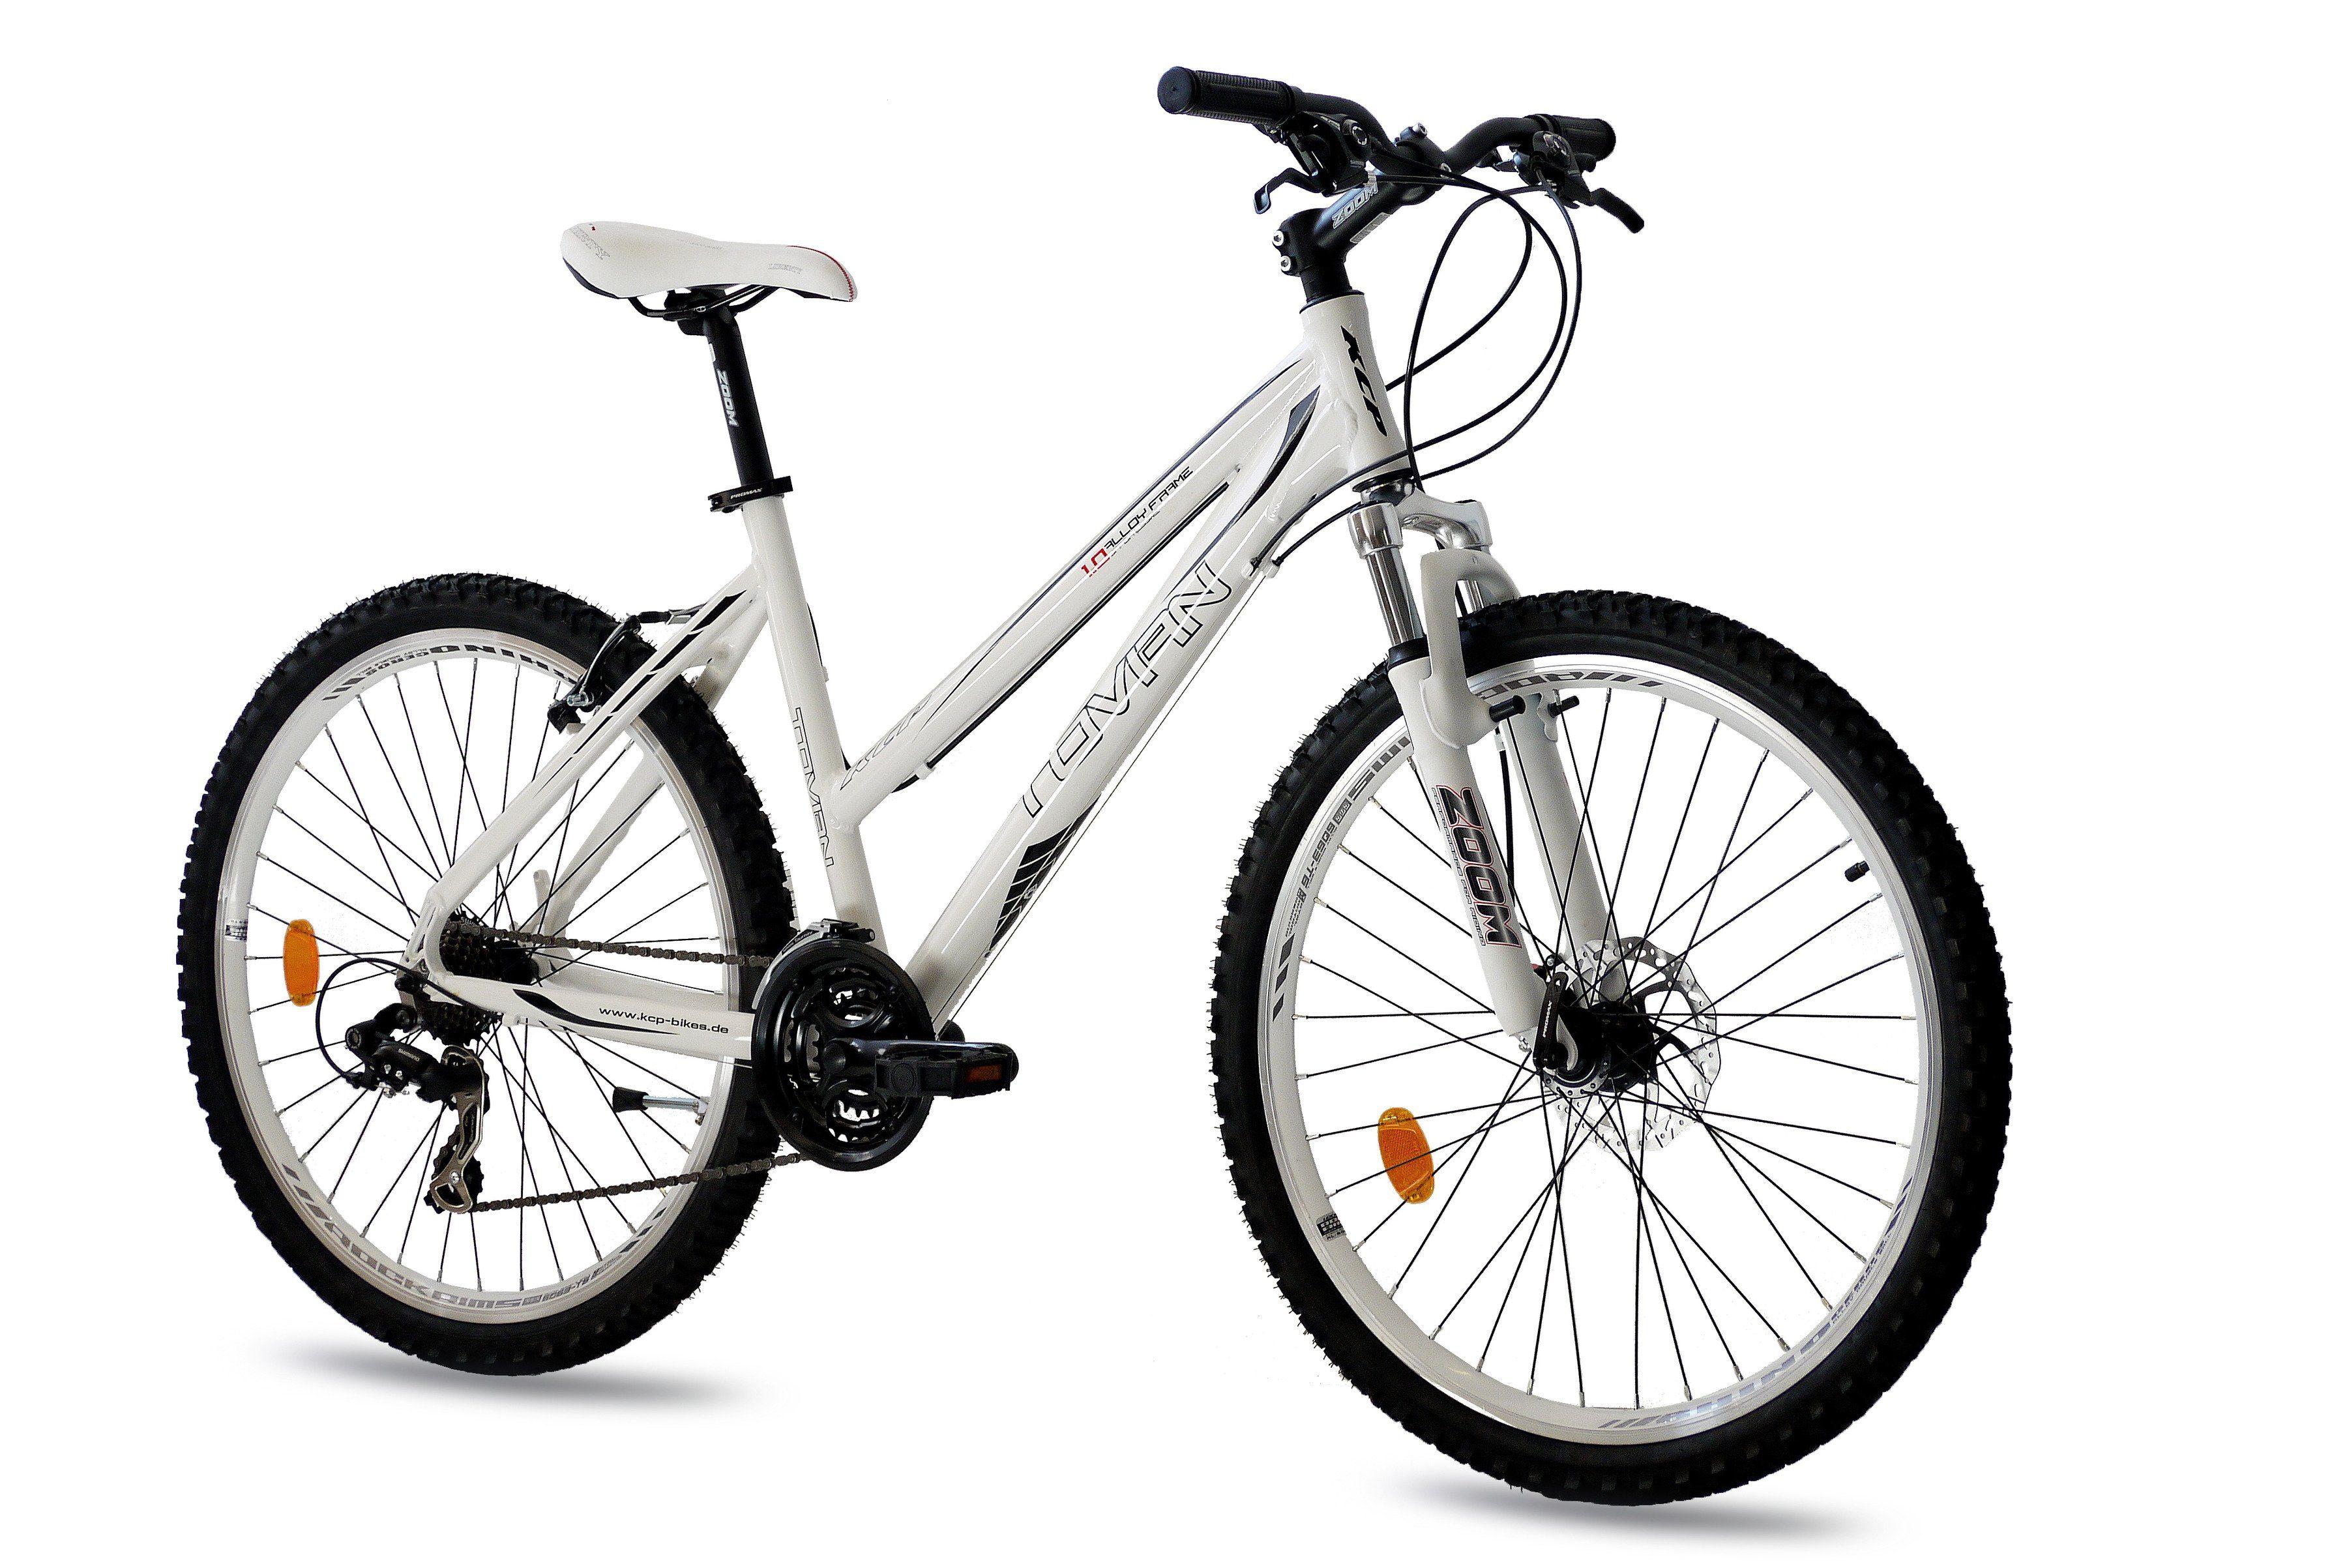 Mountainbike »Tovian«, 26 Zoll, 21 Gang, Scheibenbremse